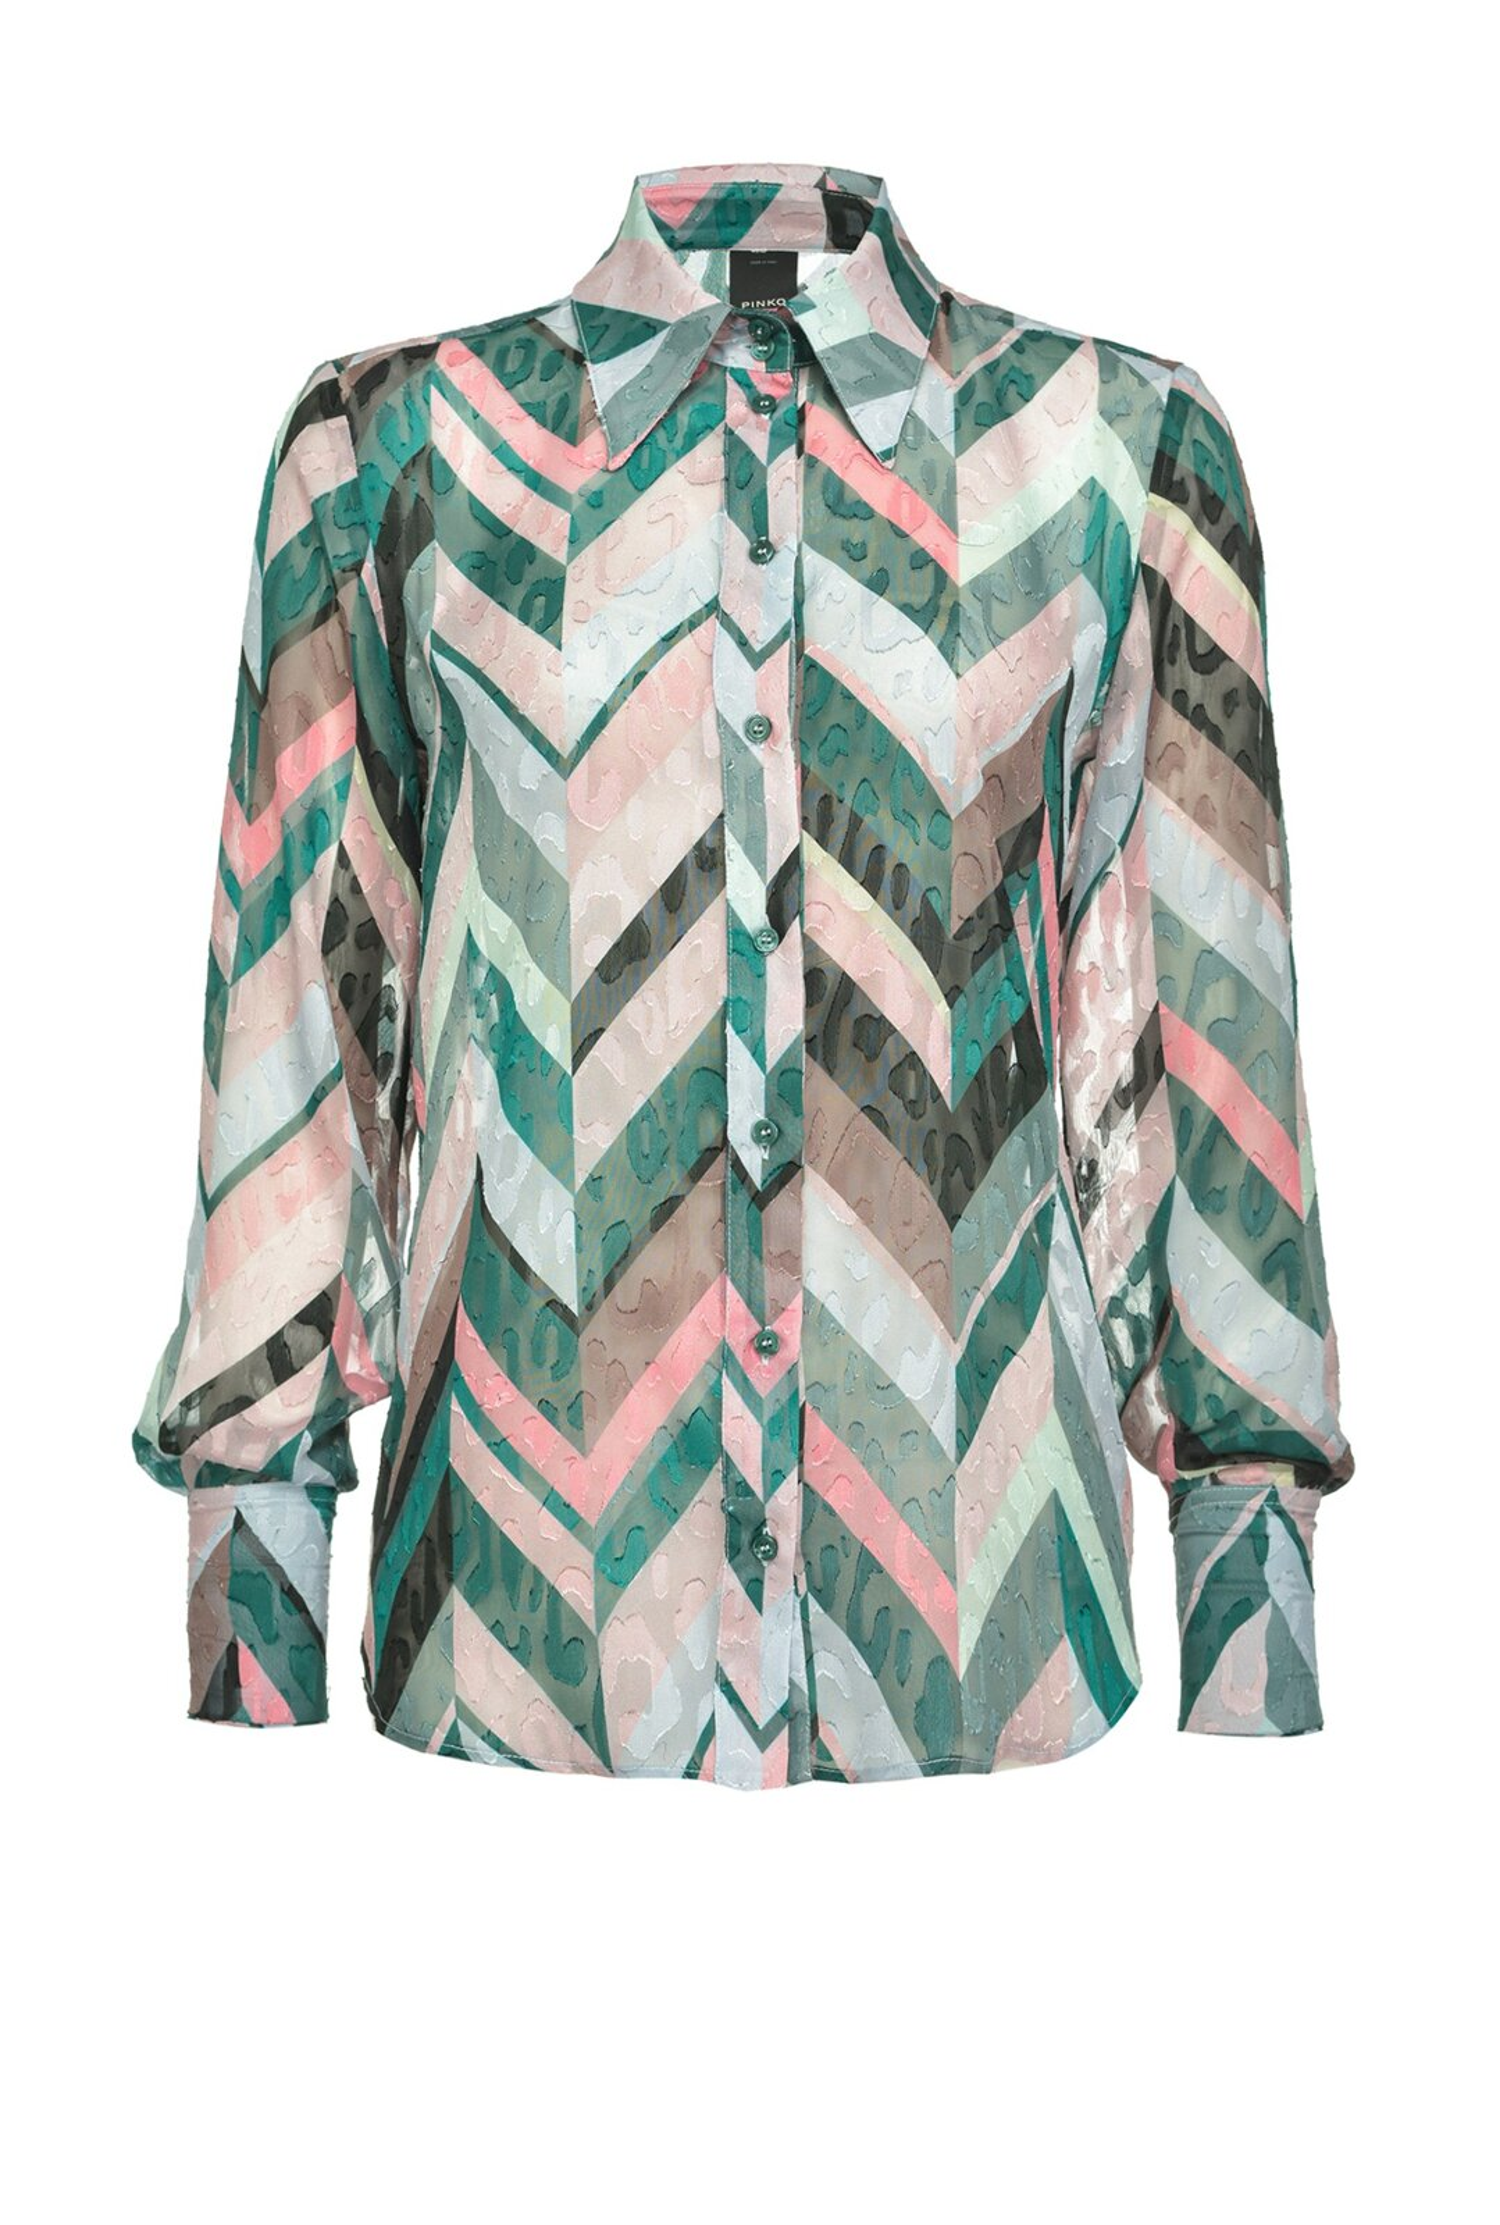 Chevron Striped Shirt - Pinko